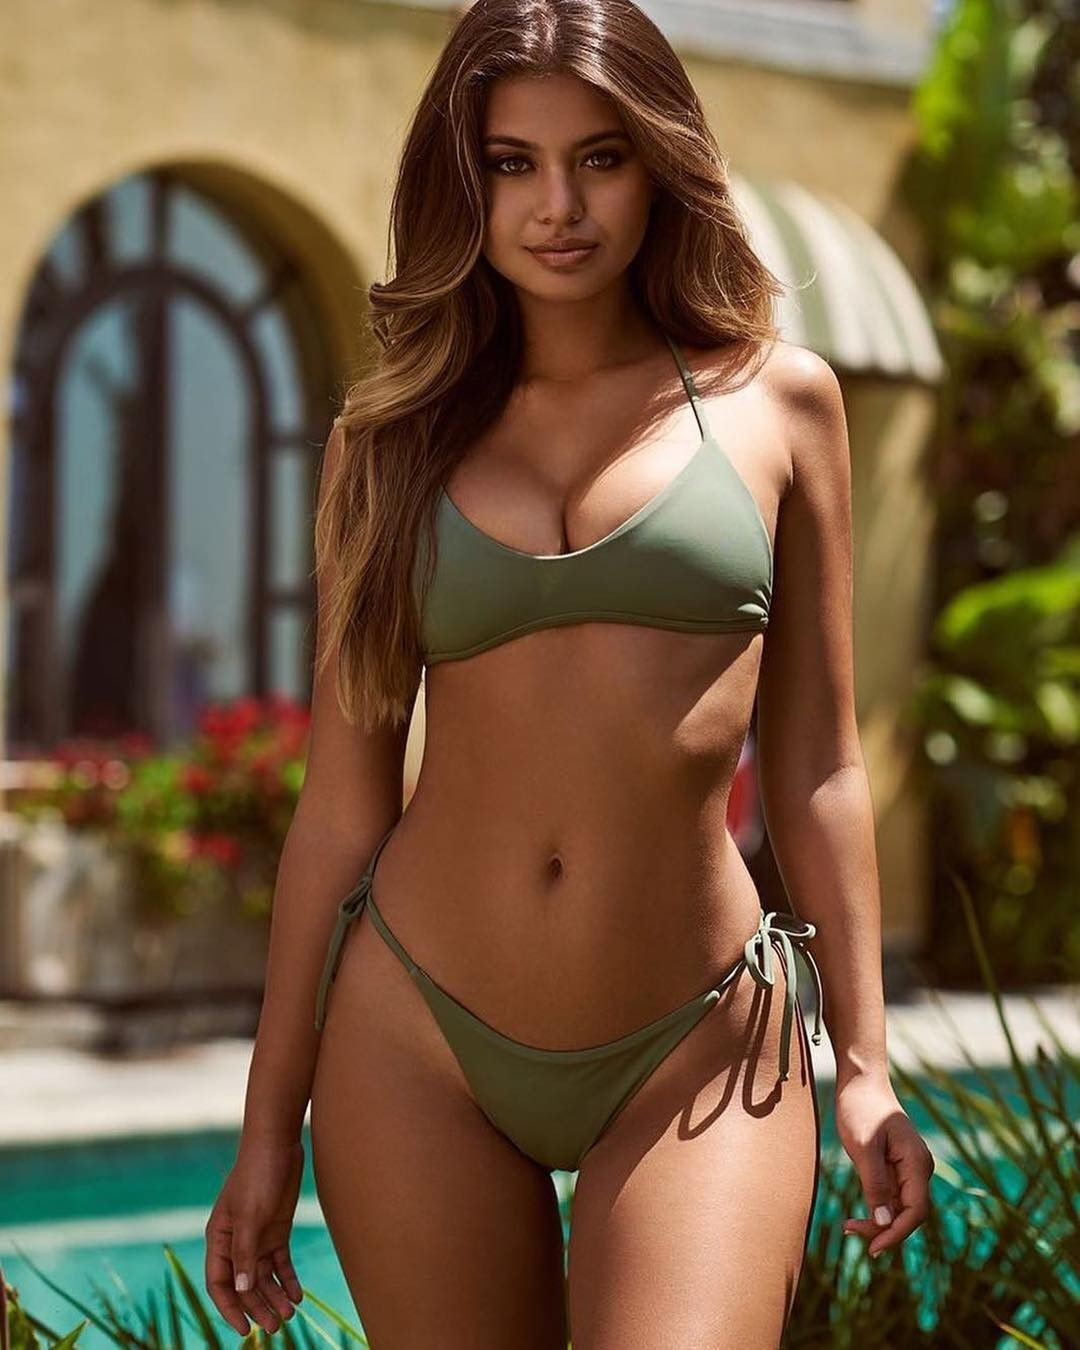 Skeet bikini best — img 2